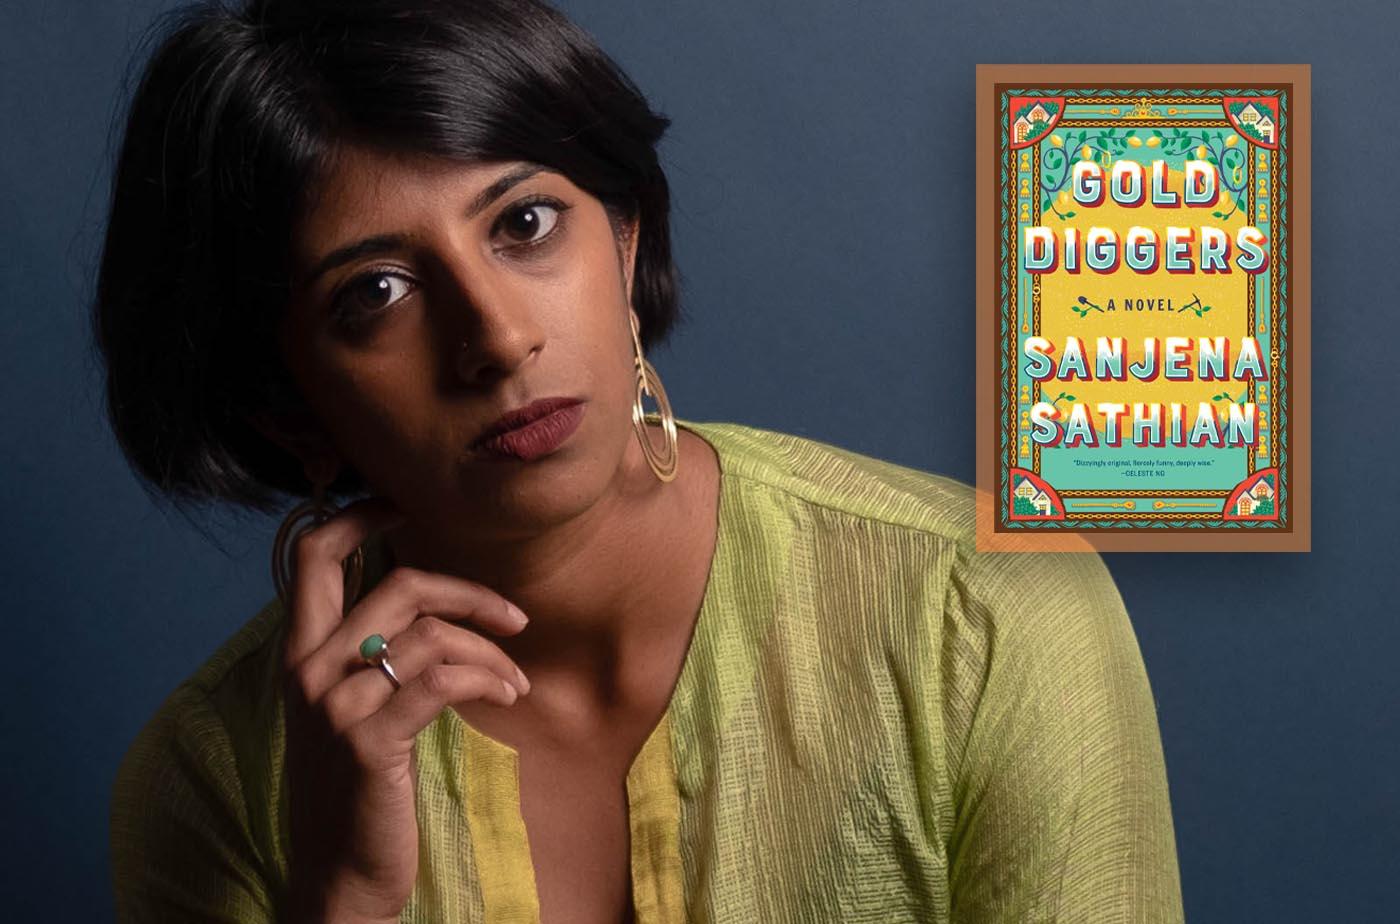 Catapult online classes: Sanjena Sathian, 6-Week Online Fiction Workshop: The Real & the Unreal, Fiction, Workshop